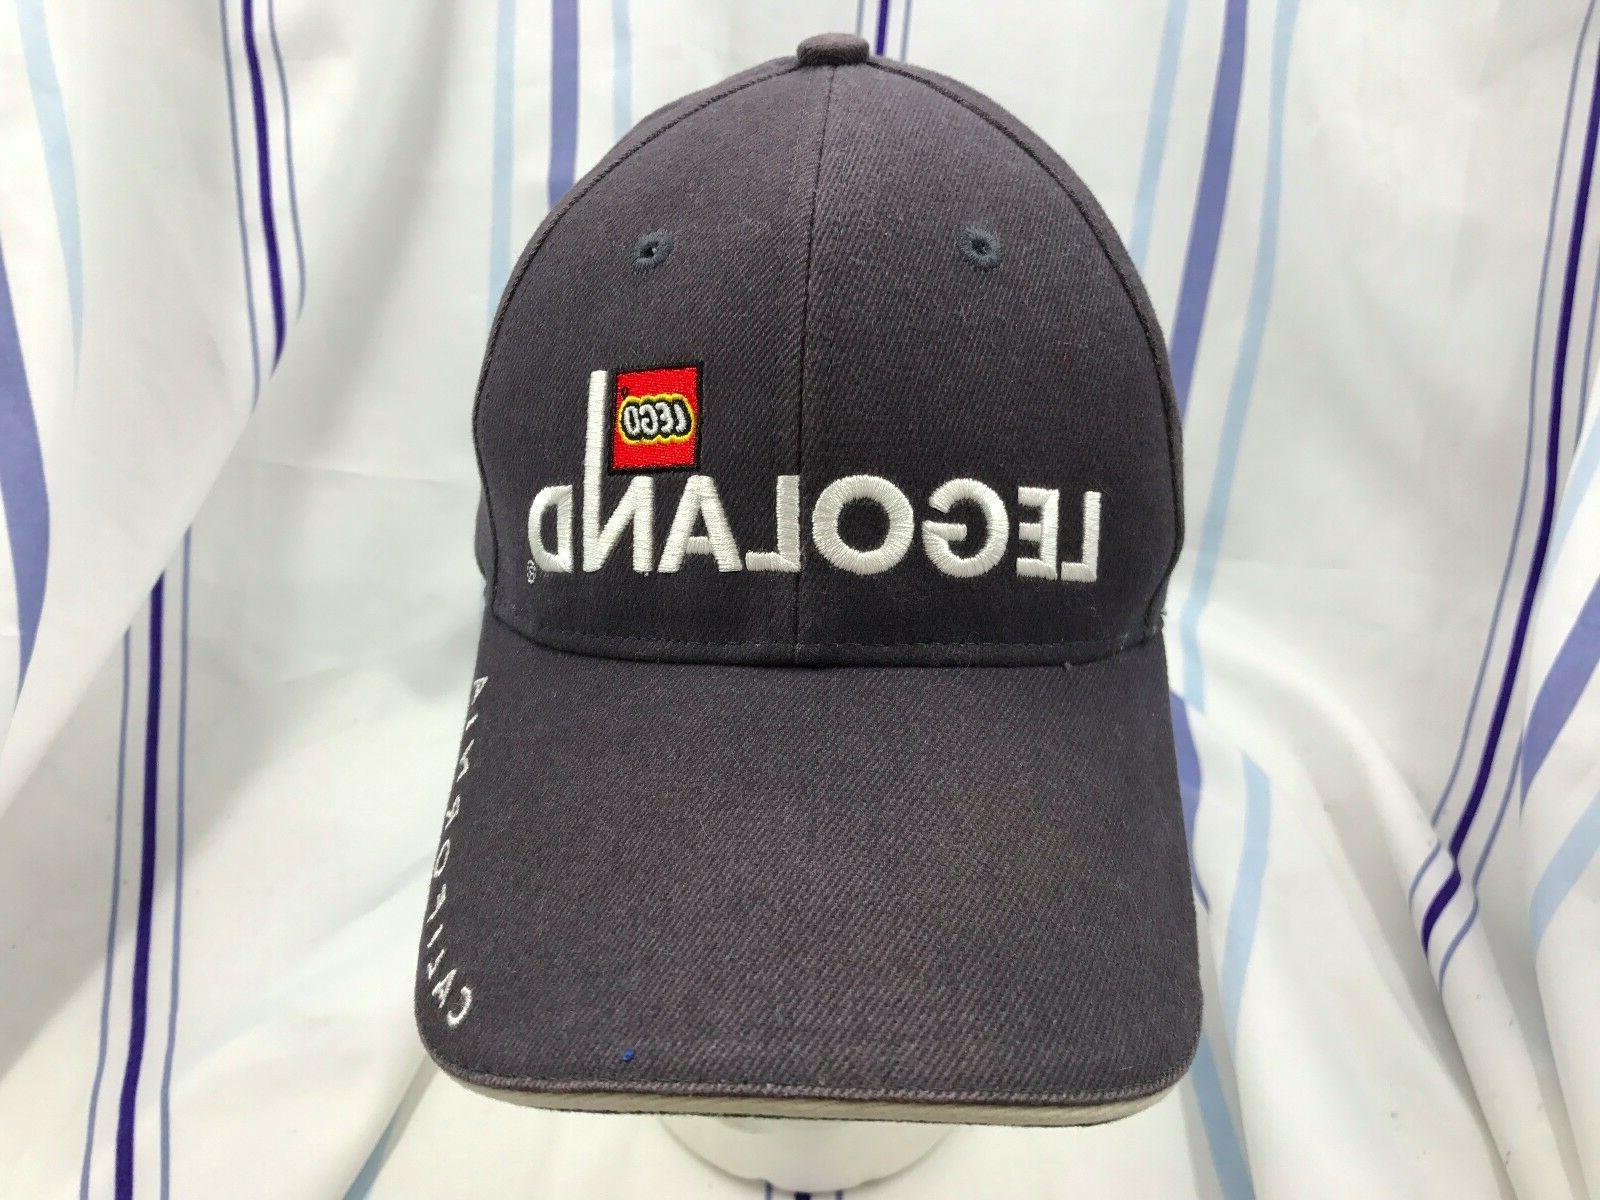 Legoland Lego California Adjustable Embroidered Trucker Hat